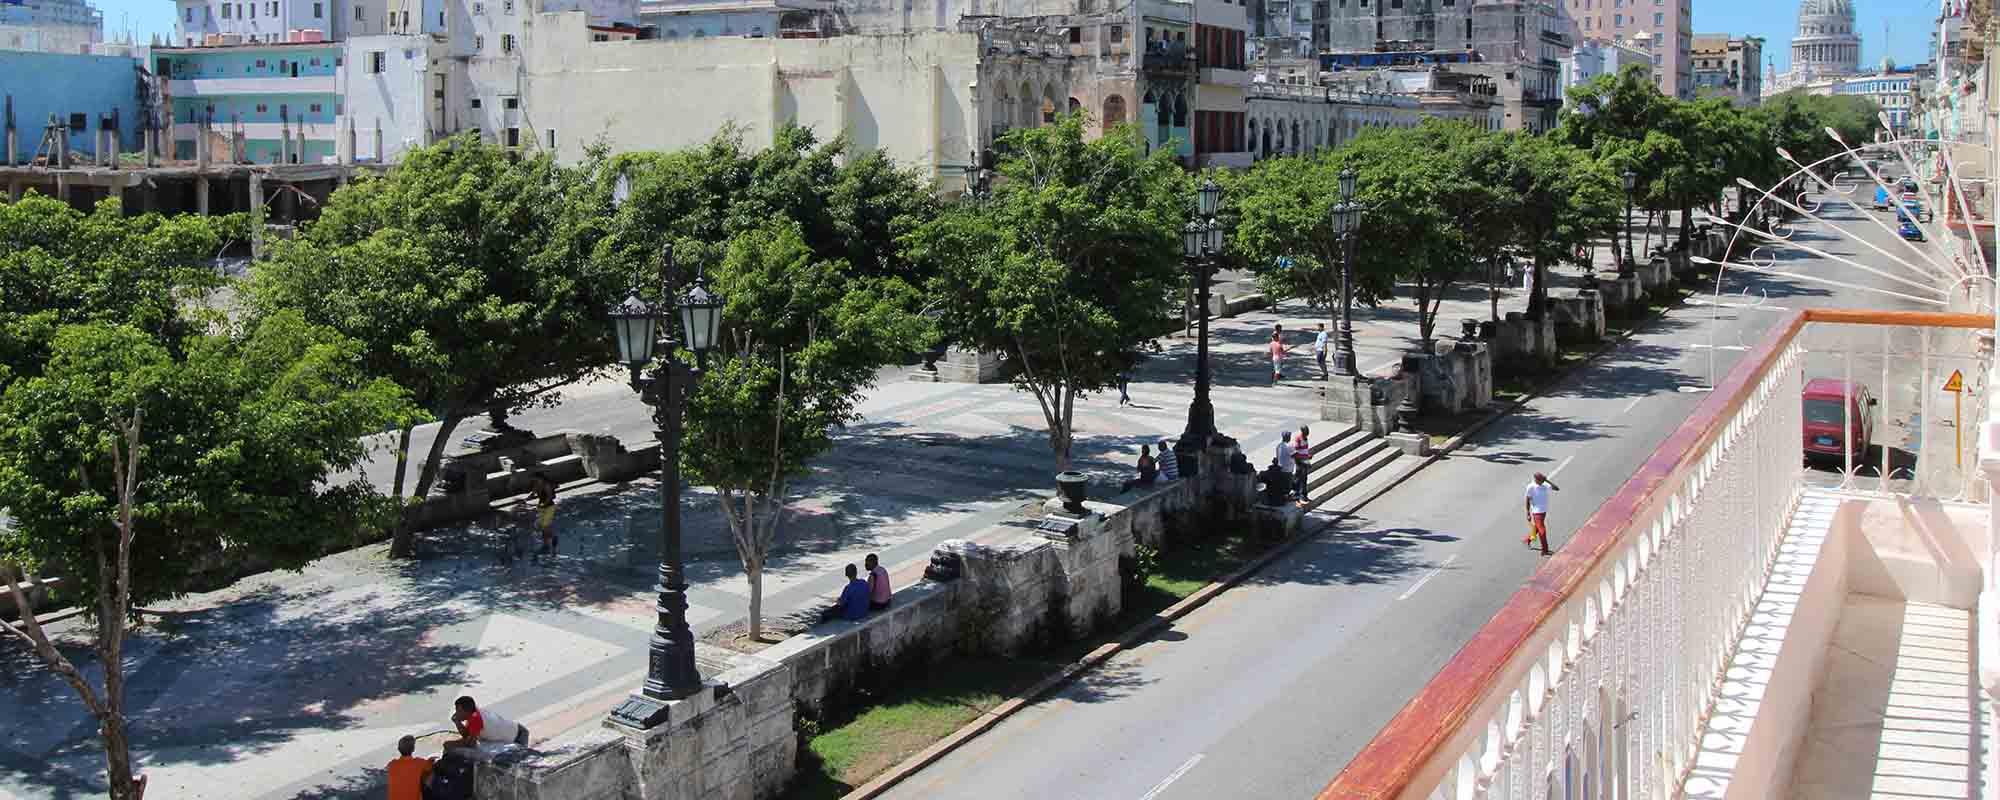 Casa Prado, Havana